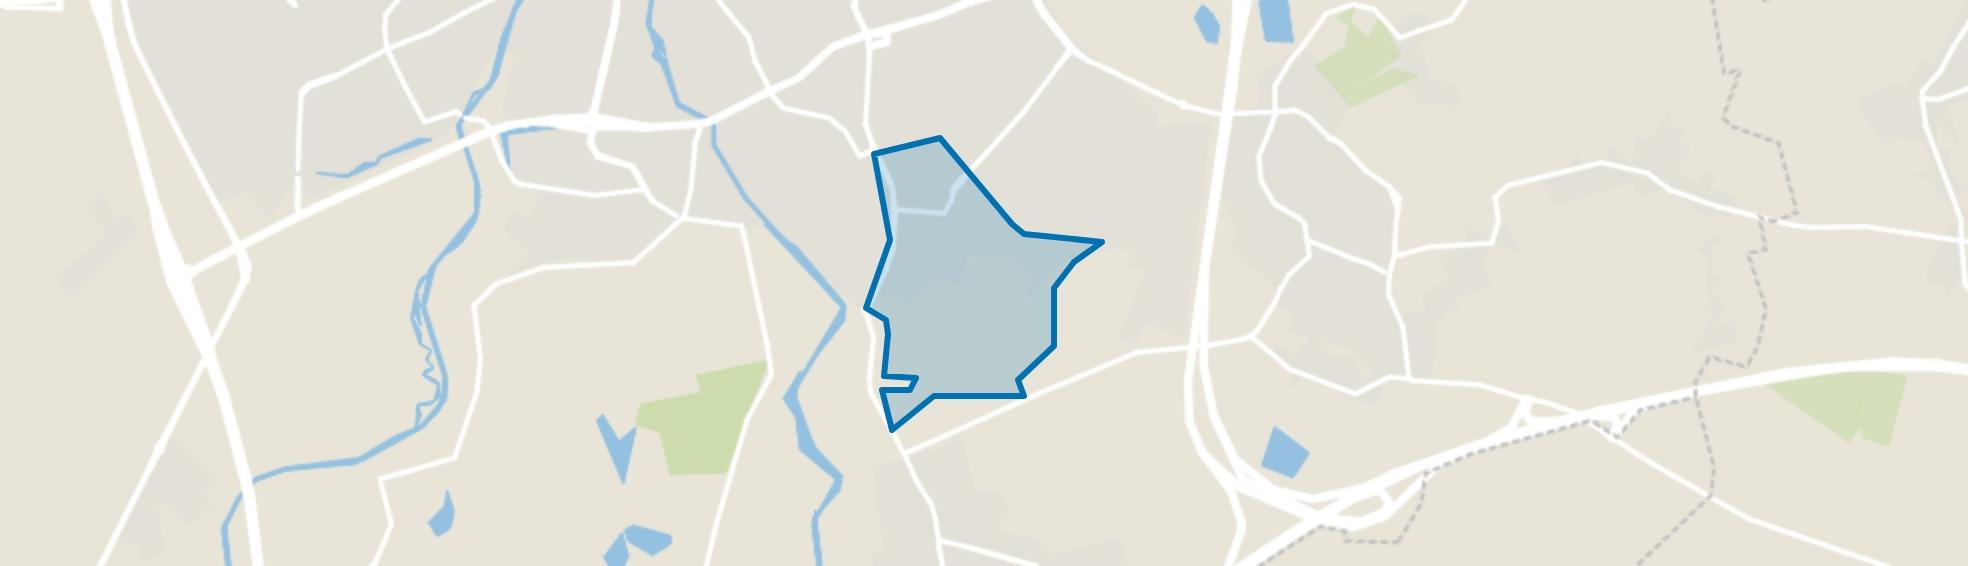 Overakker, Breda map